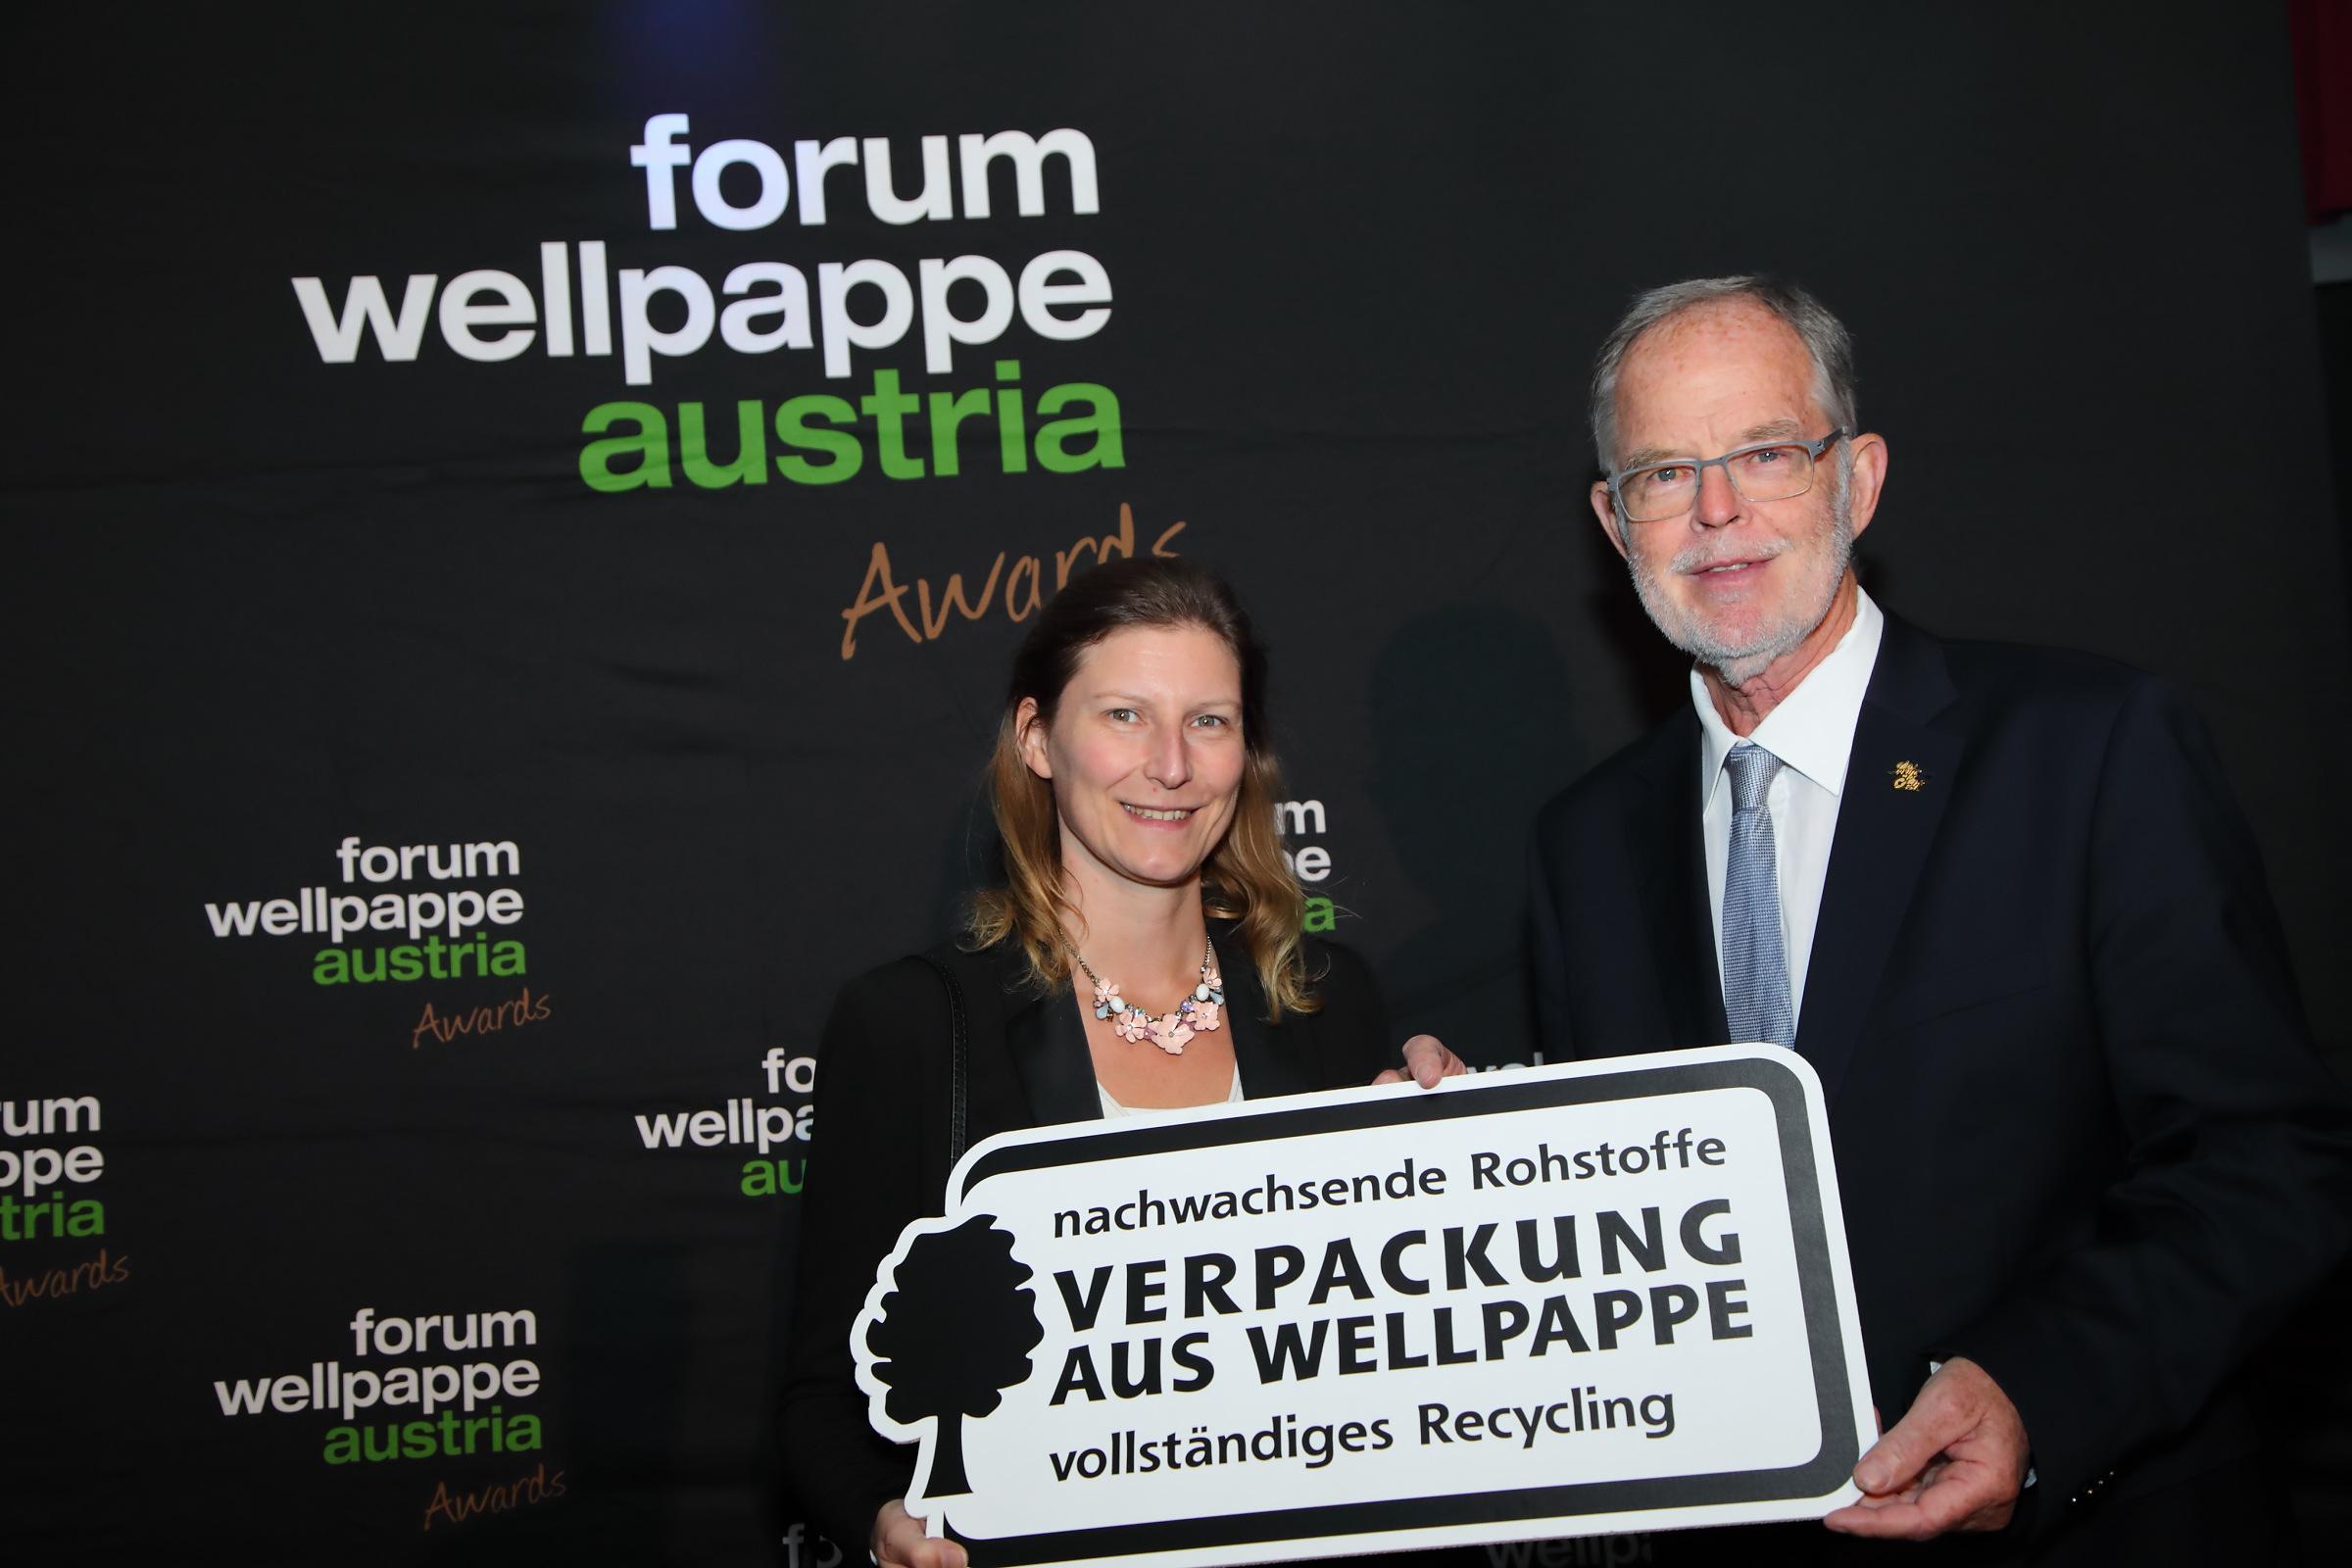 Wellpappe Austria Award 2018 © com_unit/L. Schedl